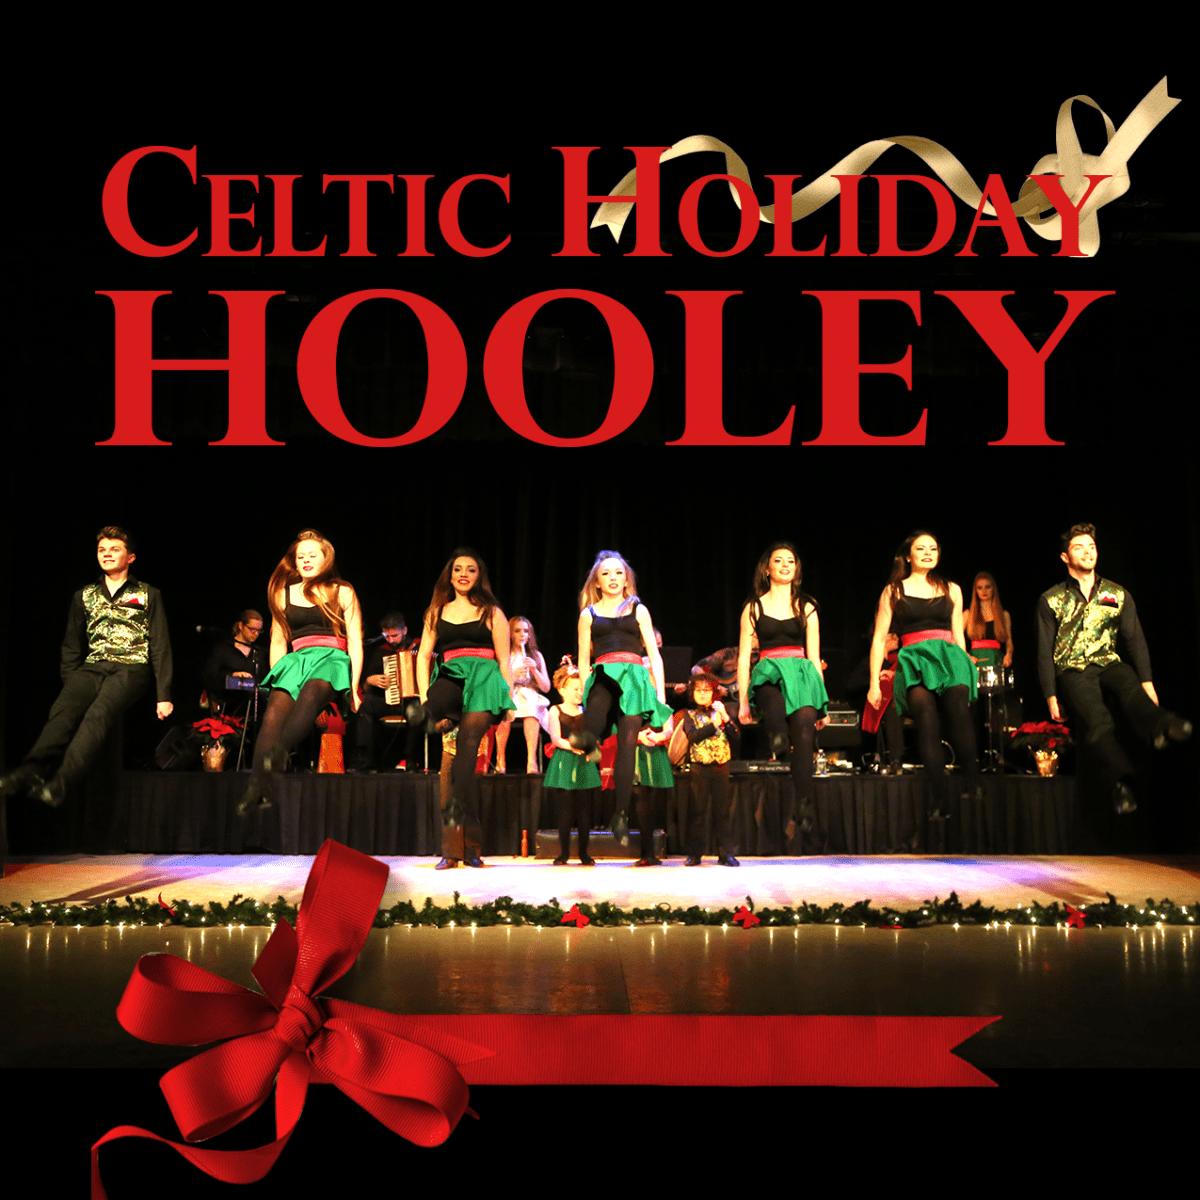 Celtic Holiday Hooley